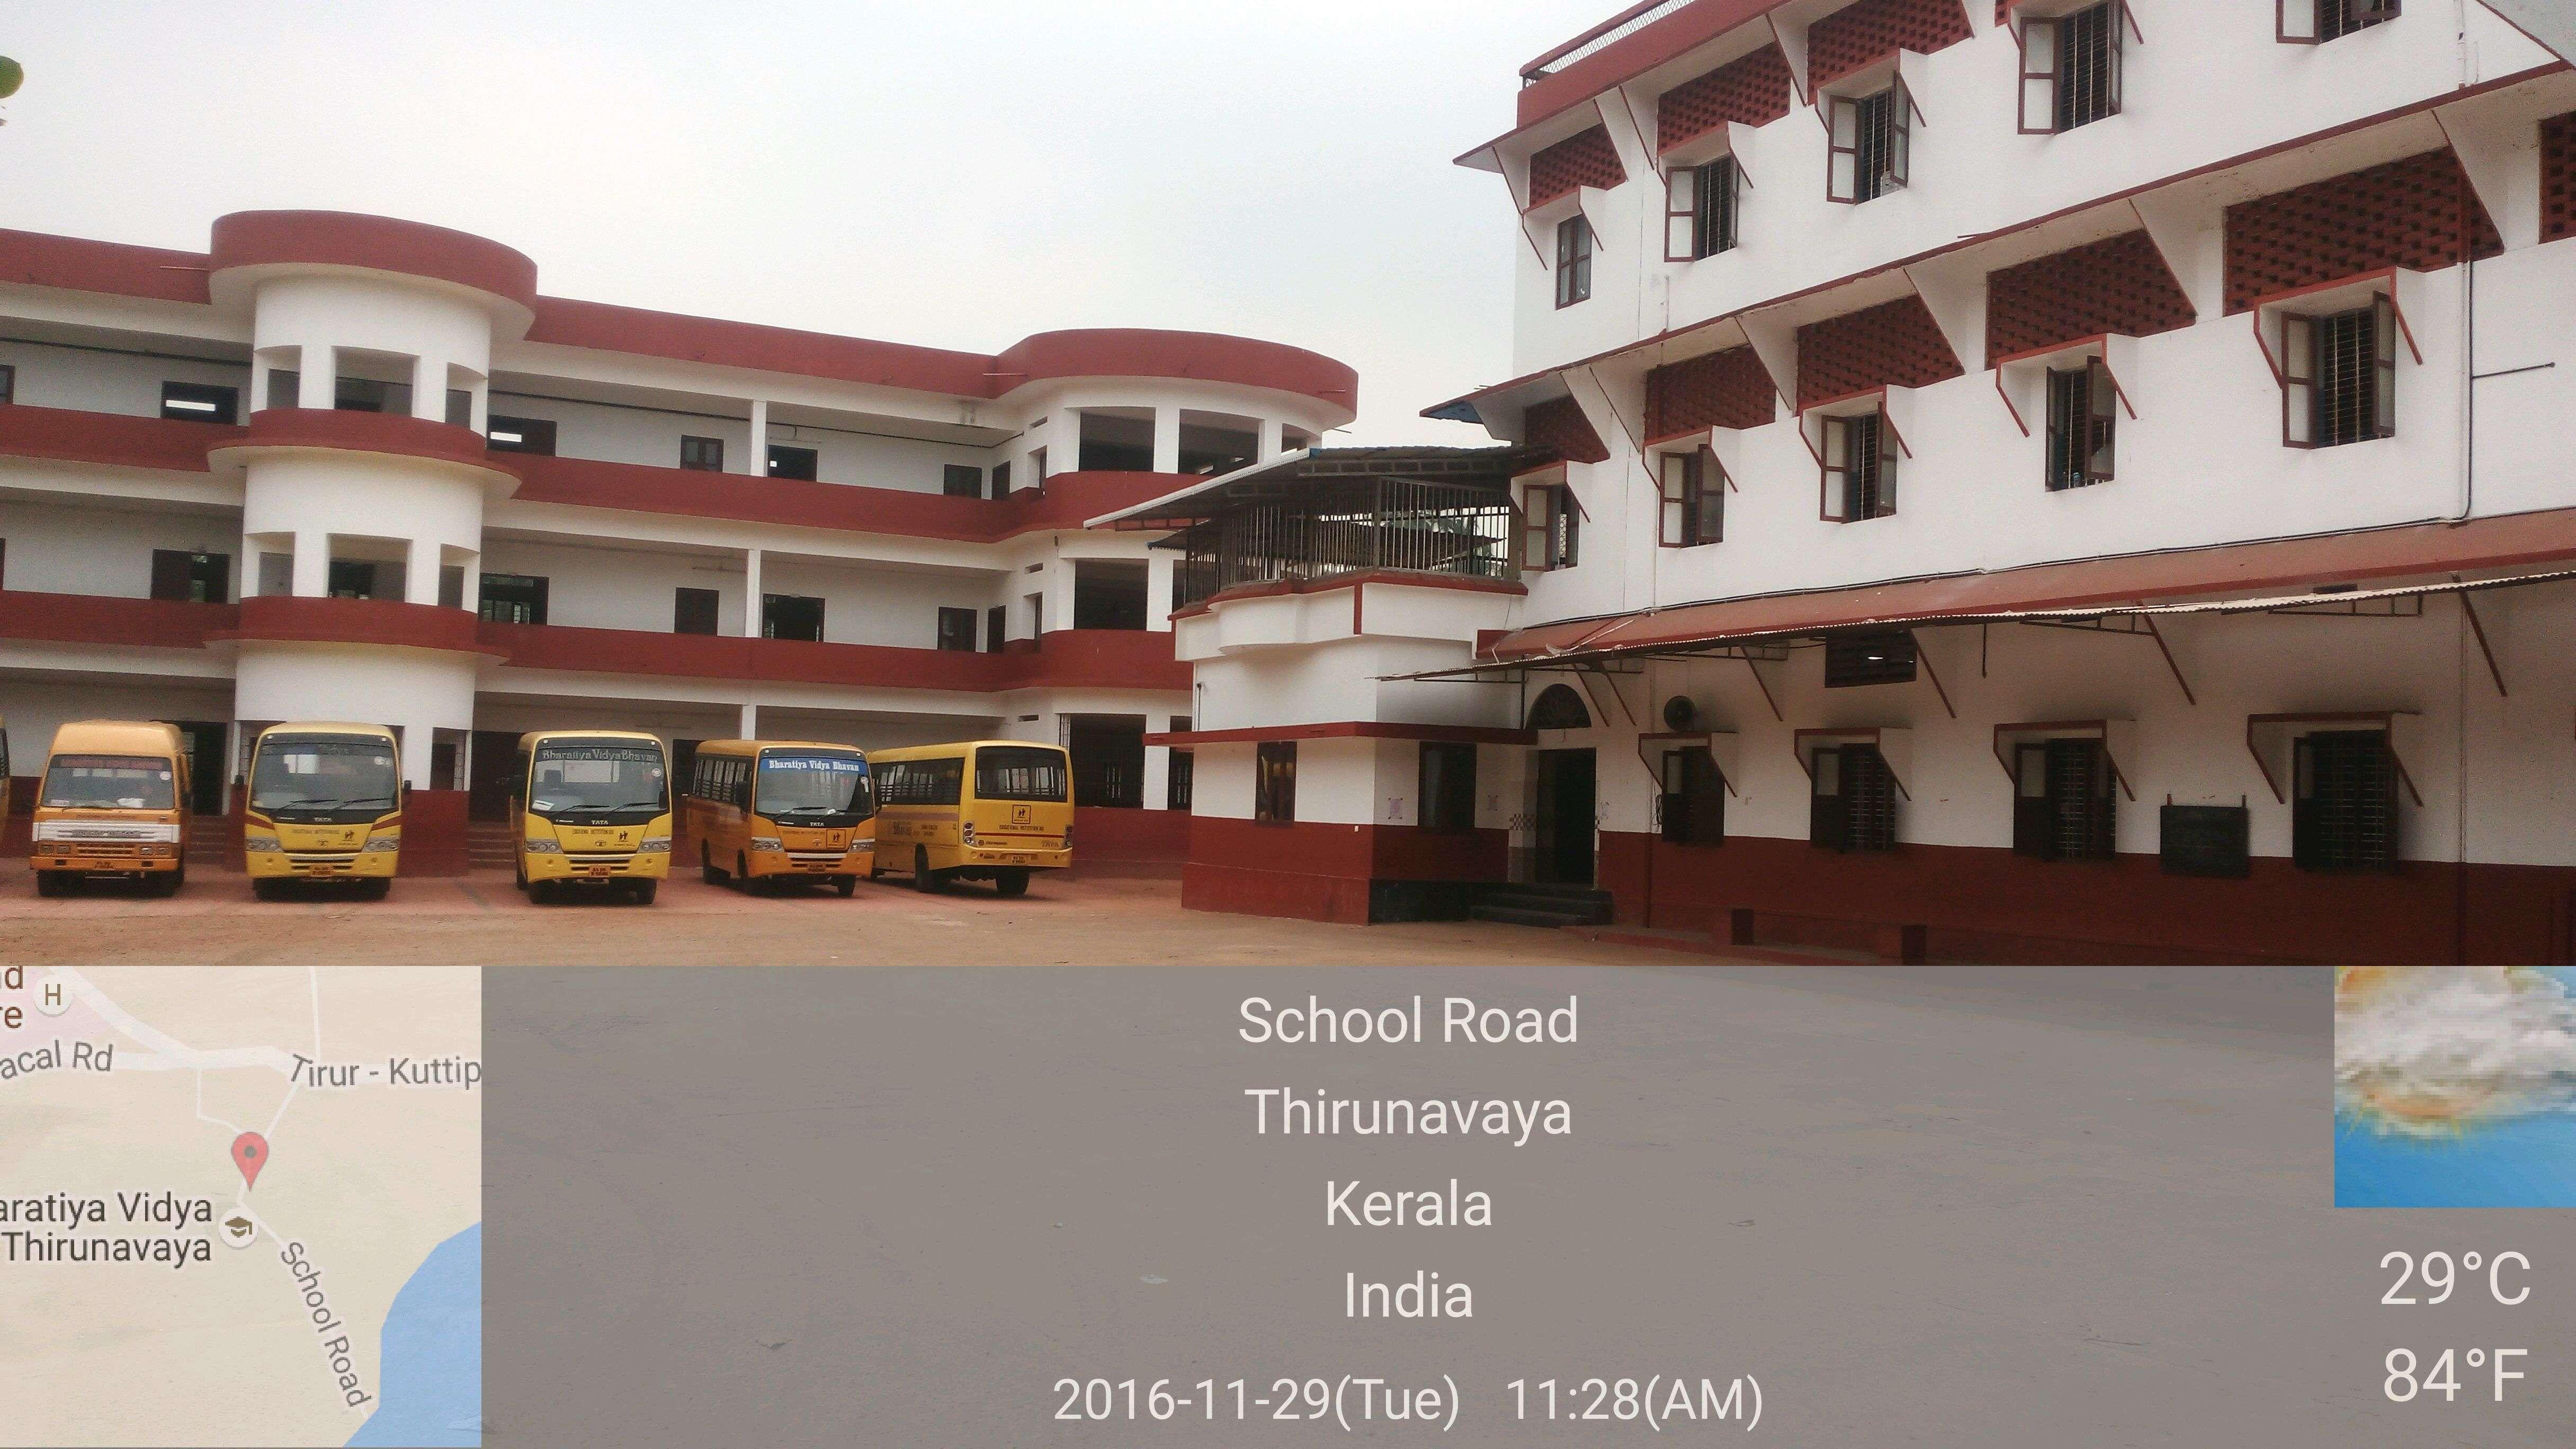 BHARATIYA VIDYA BHAWAN ENG MEDIUM SCHOOL THIRUNAVAYA MALAYAPPURAM KERALA 930317